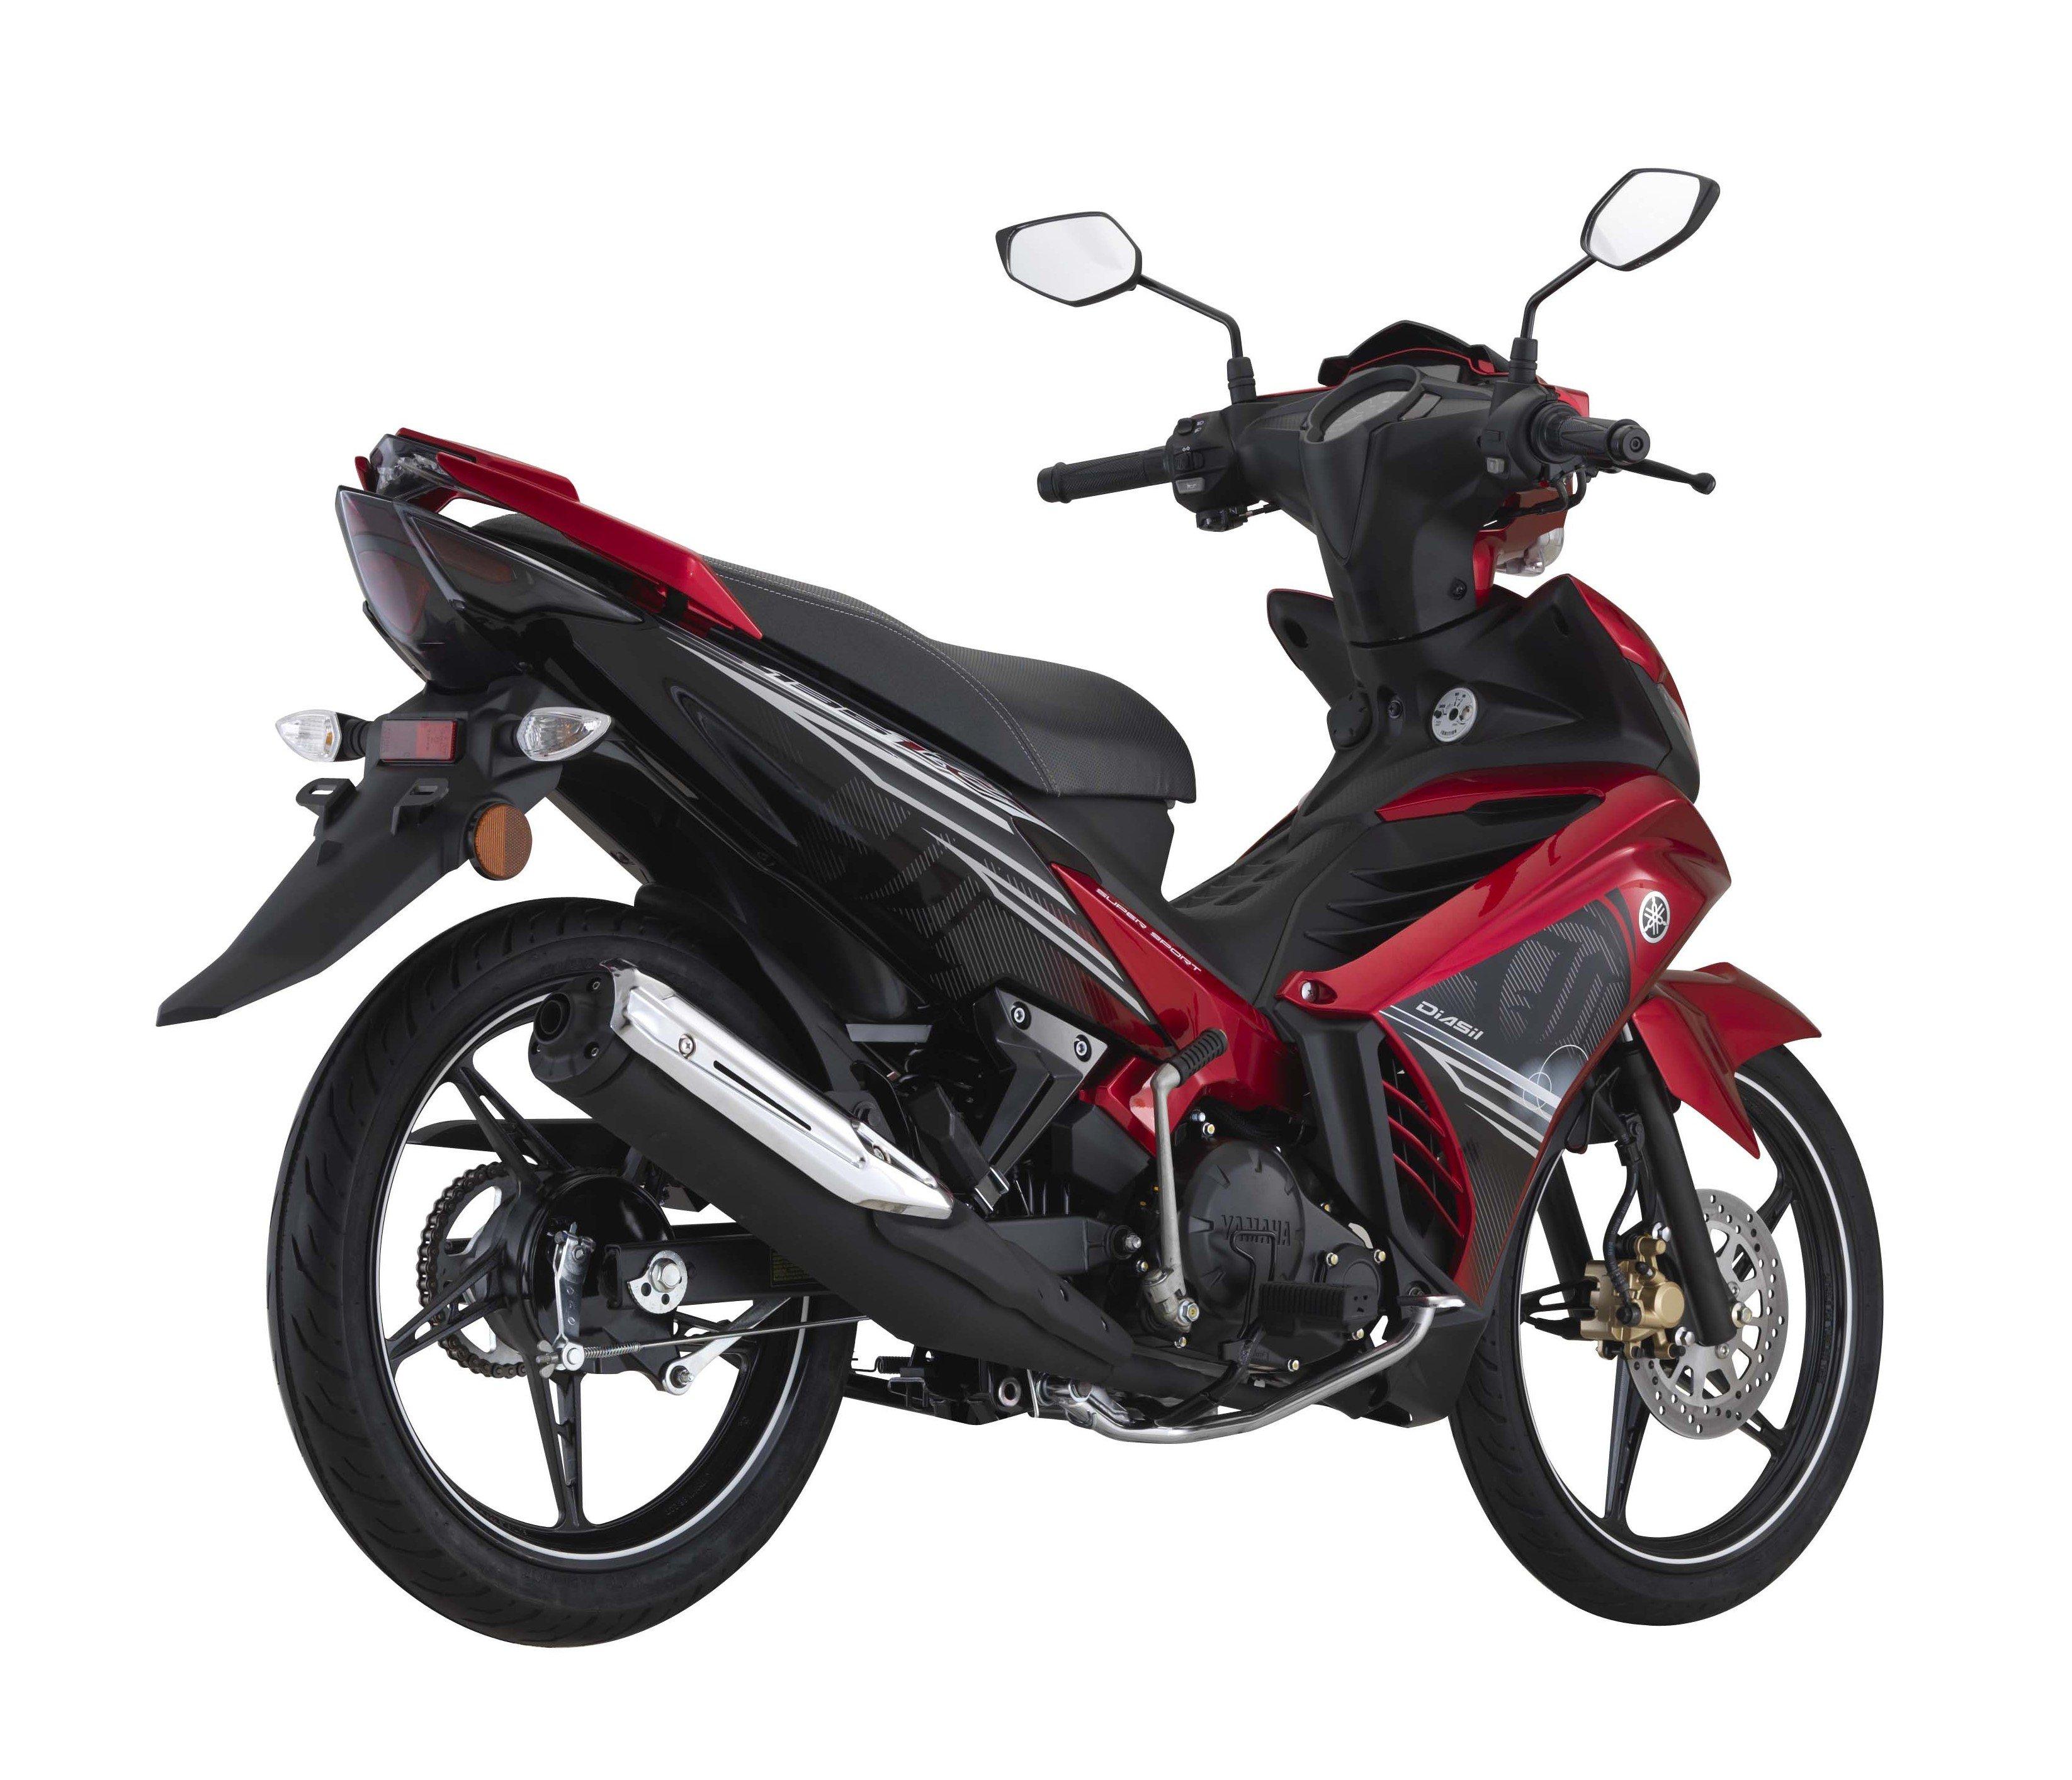 Yamaha Price